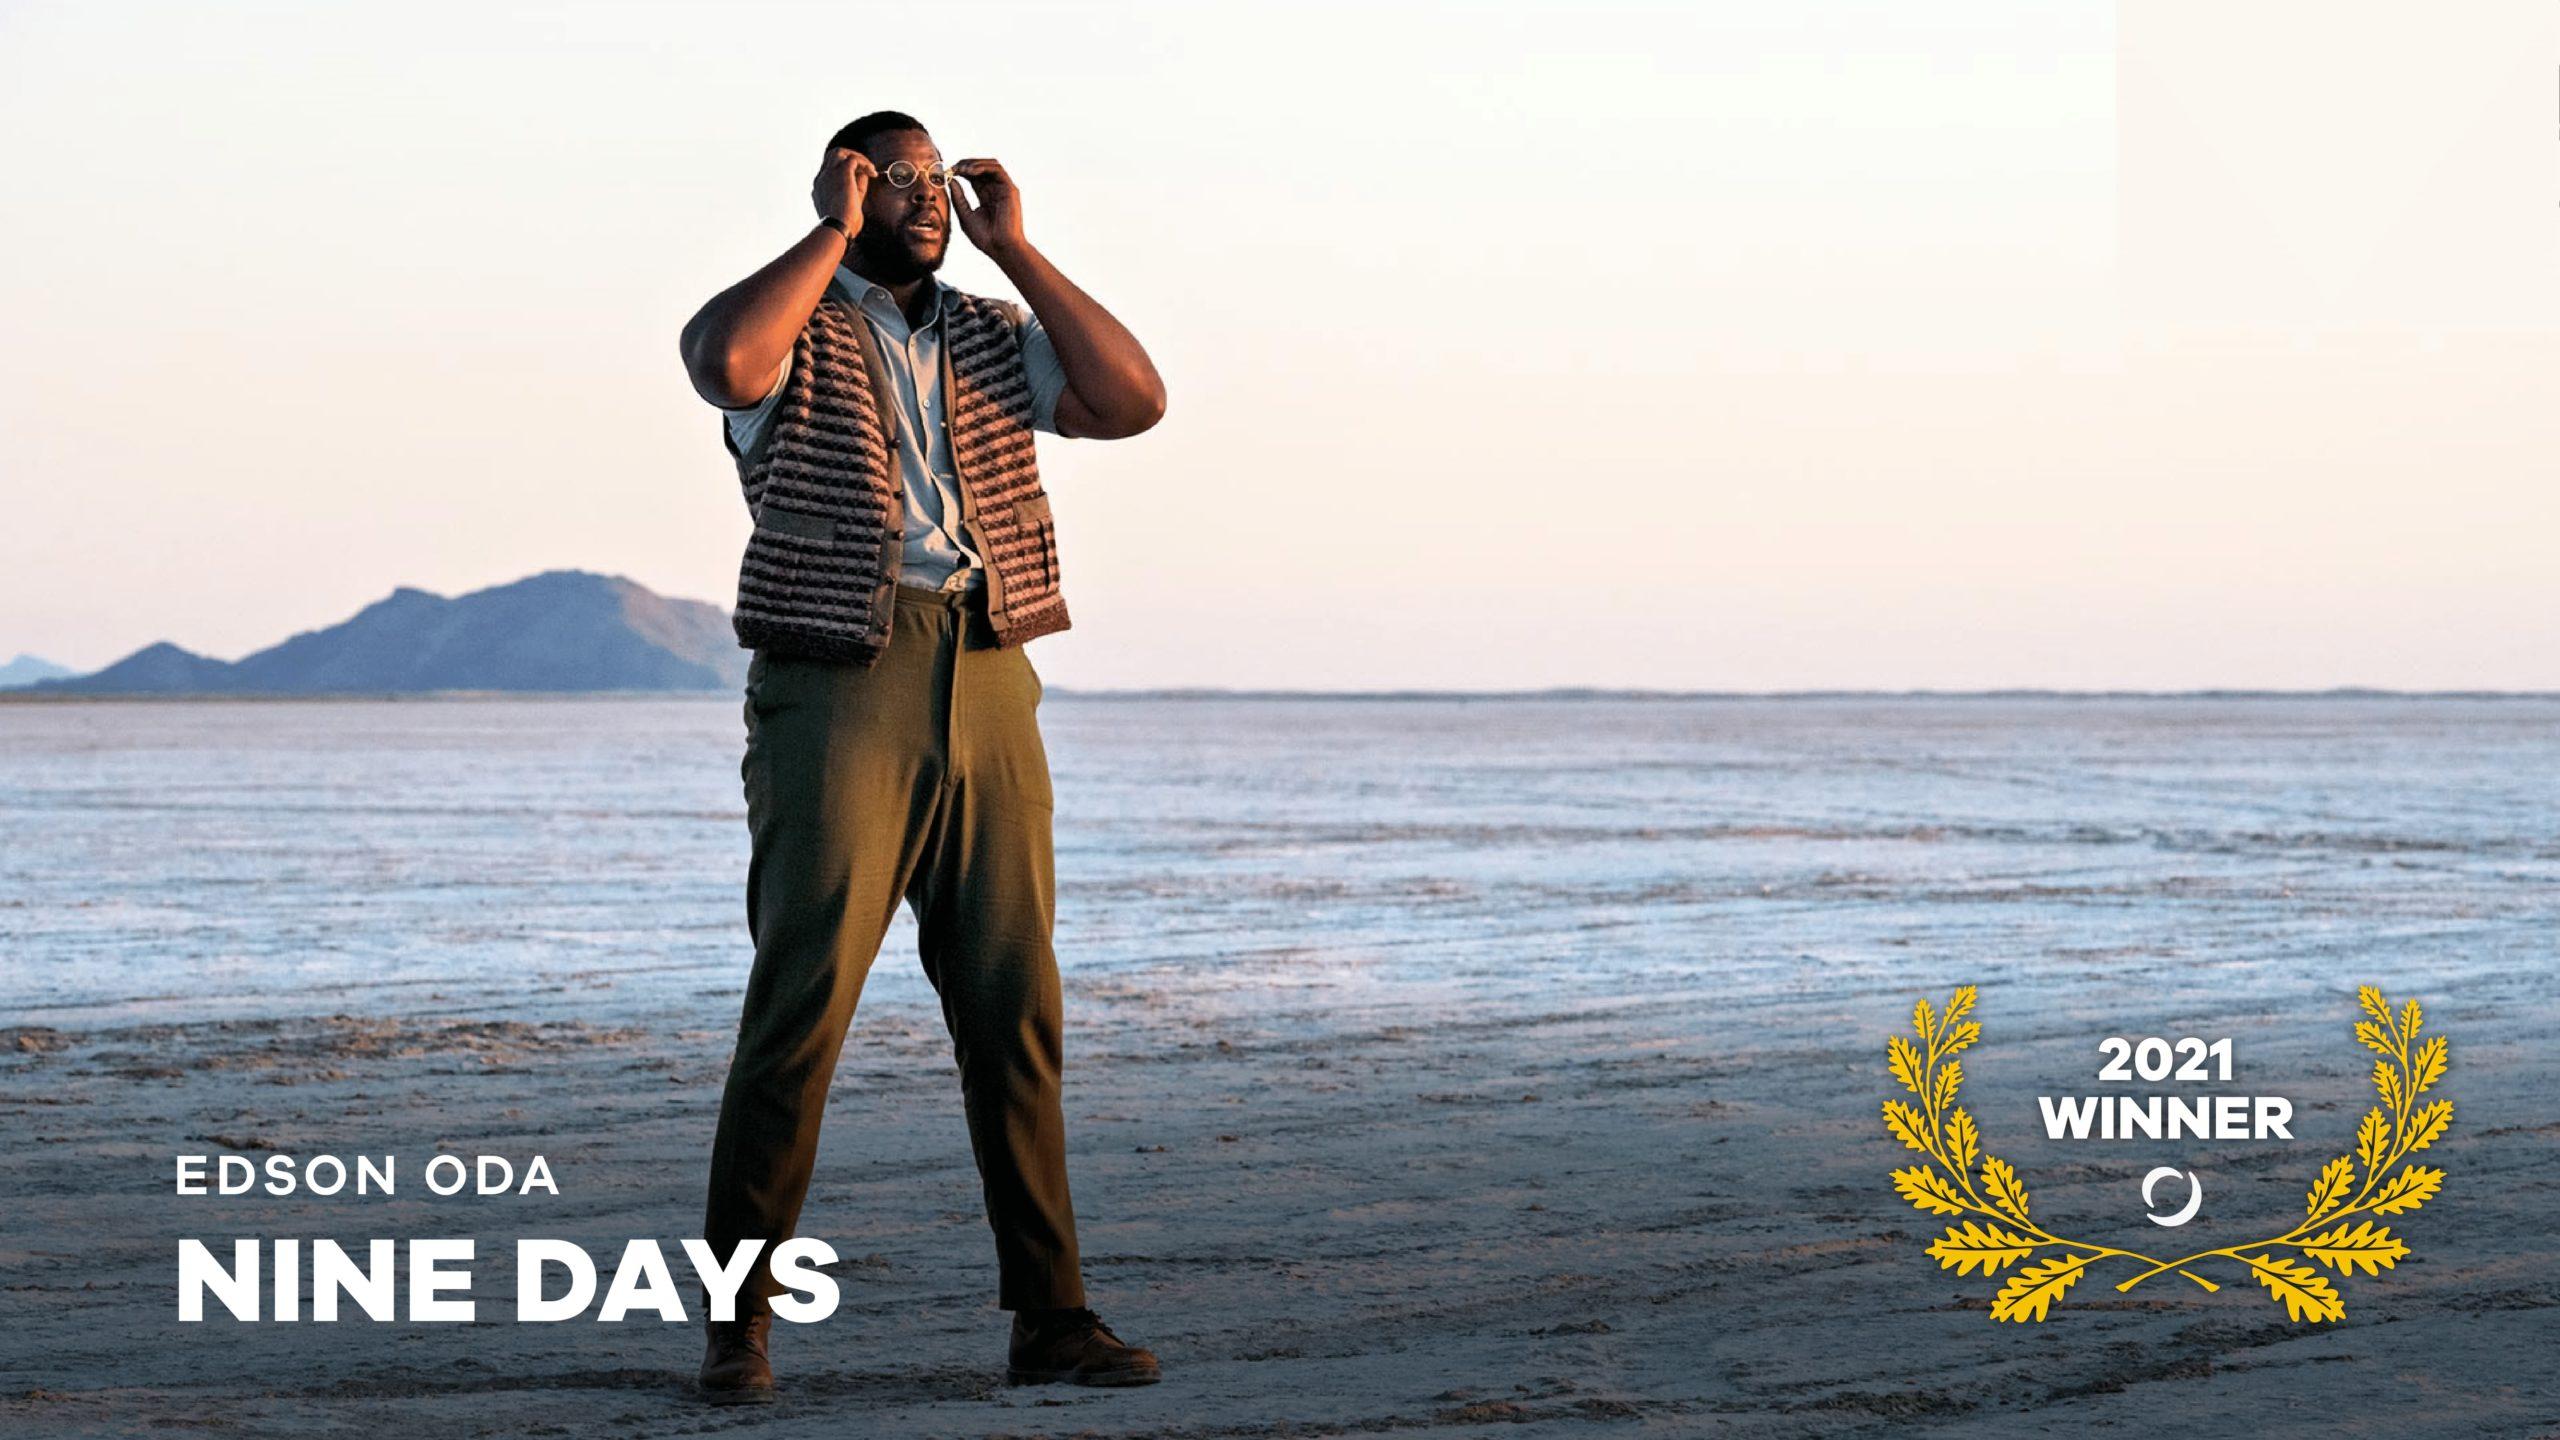 OFFA 2021 Best International Feature Film or Documentary Winner